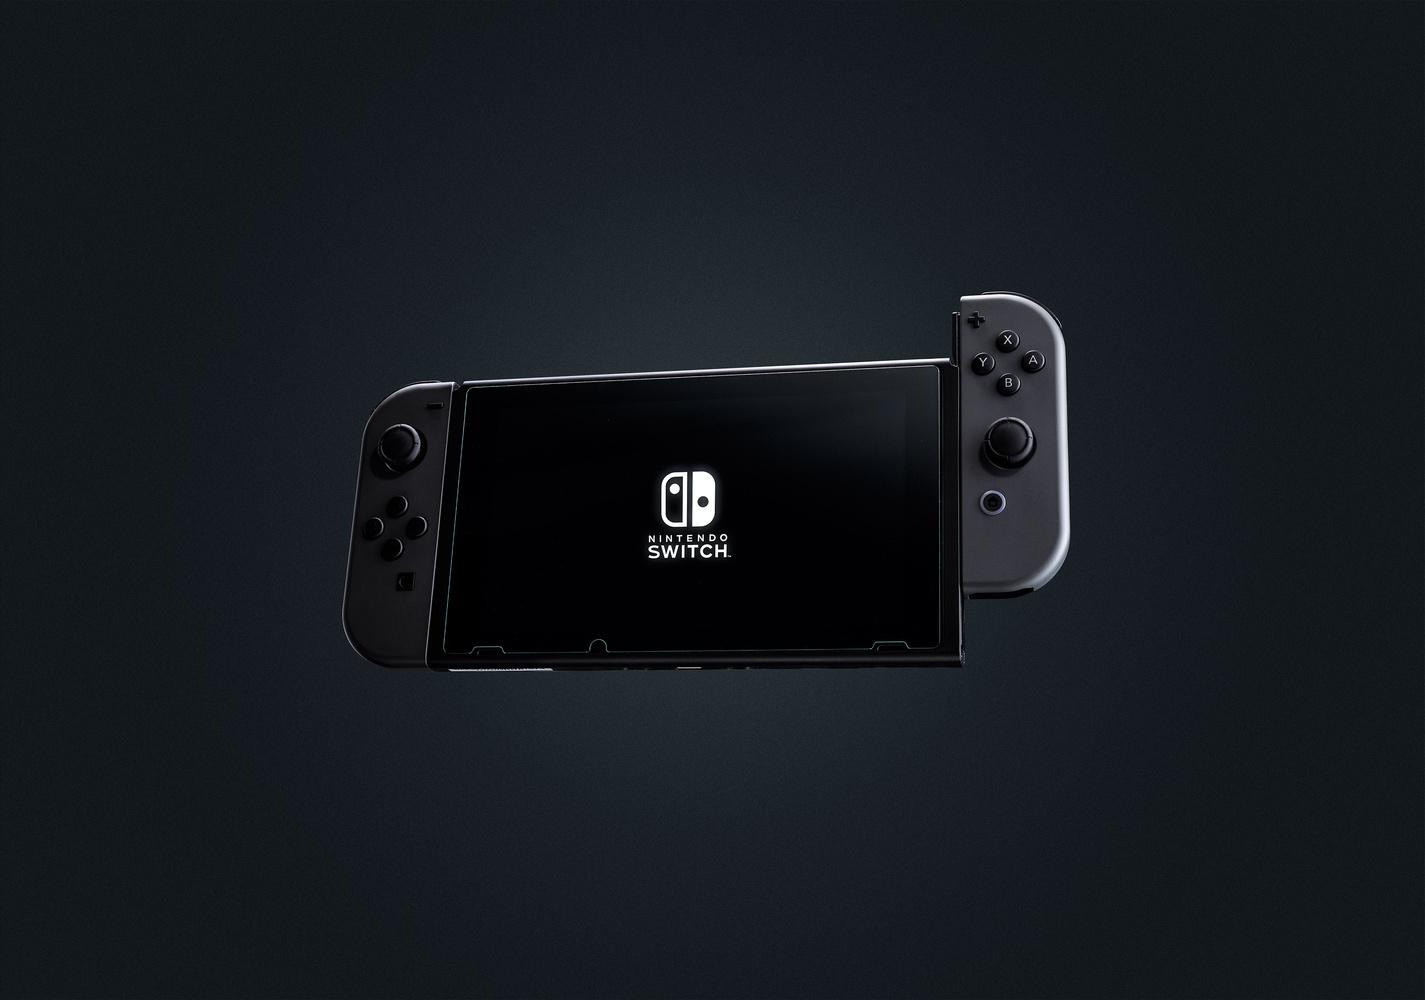 Nintendo Switch Black by Klif Lin